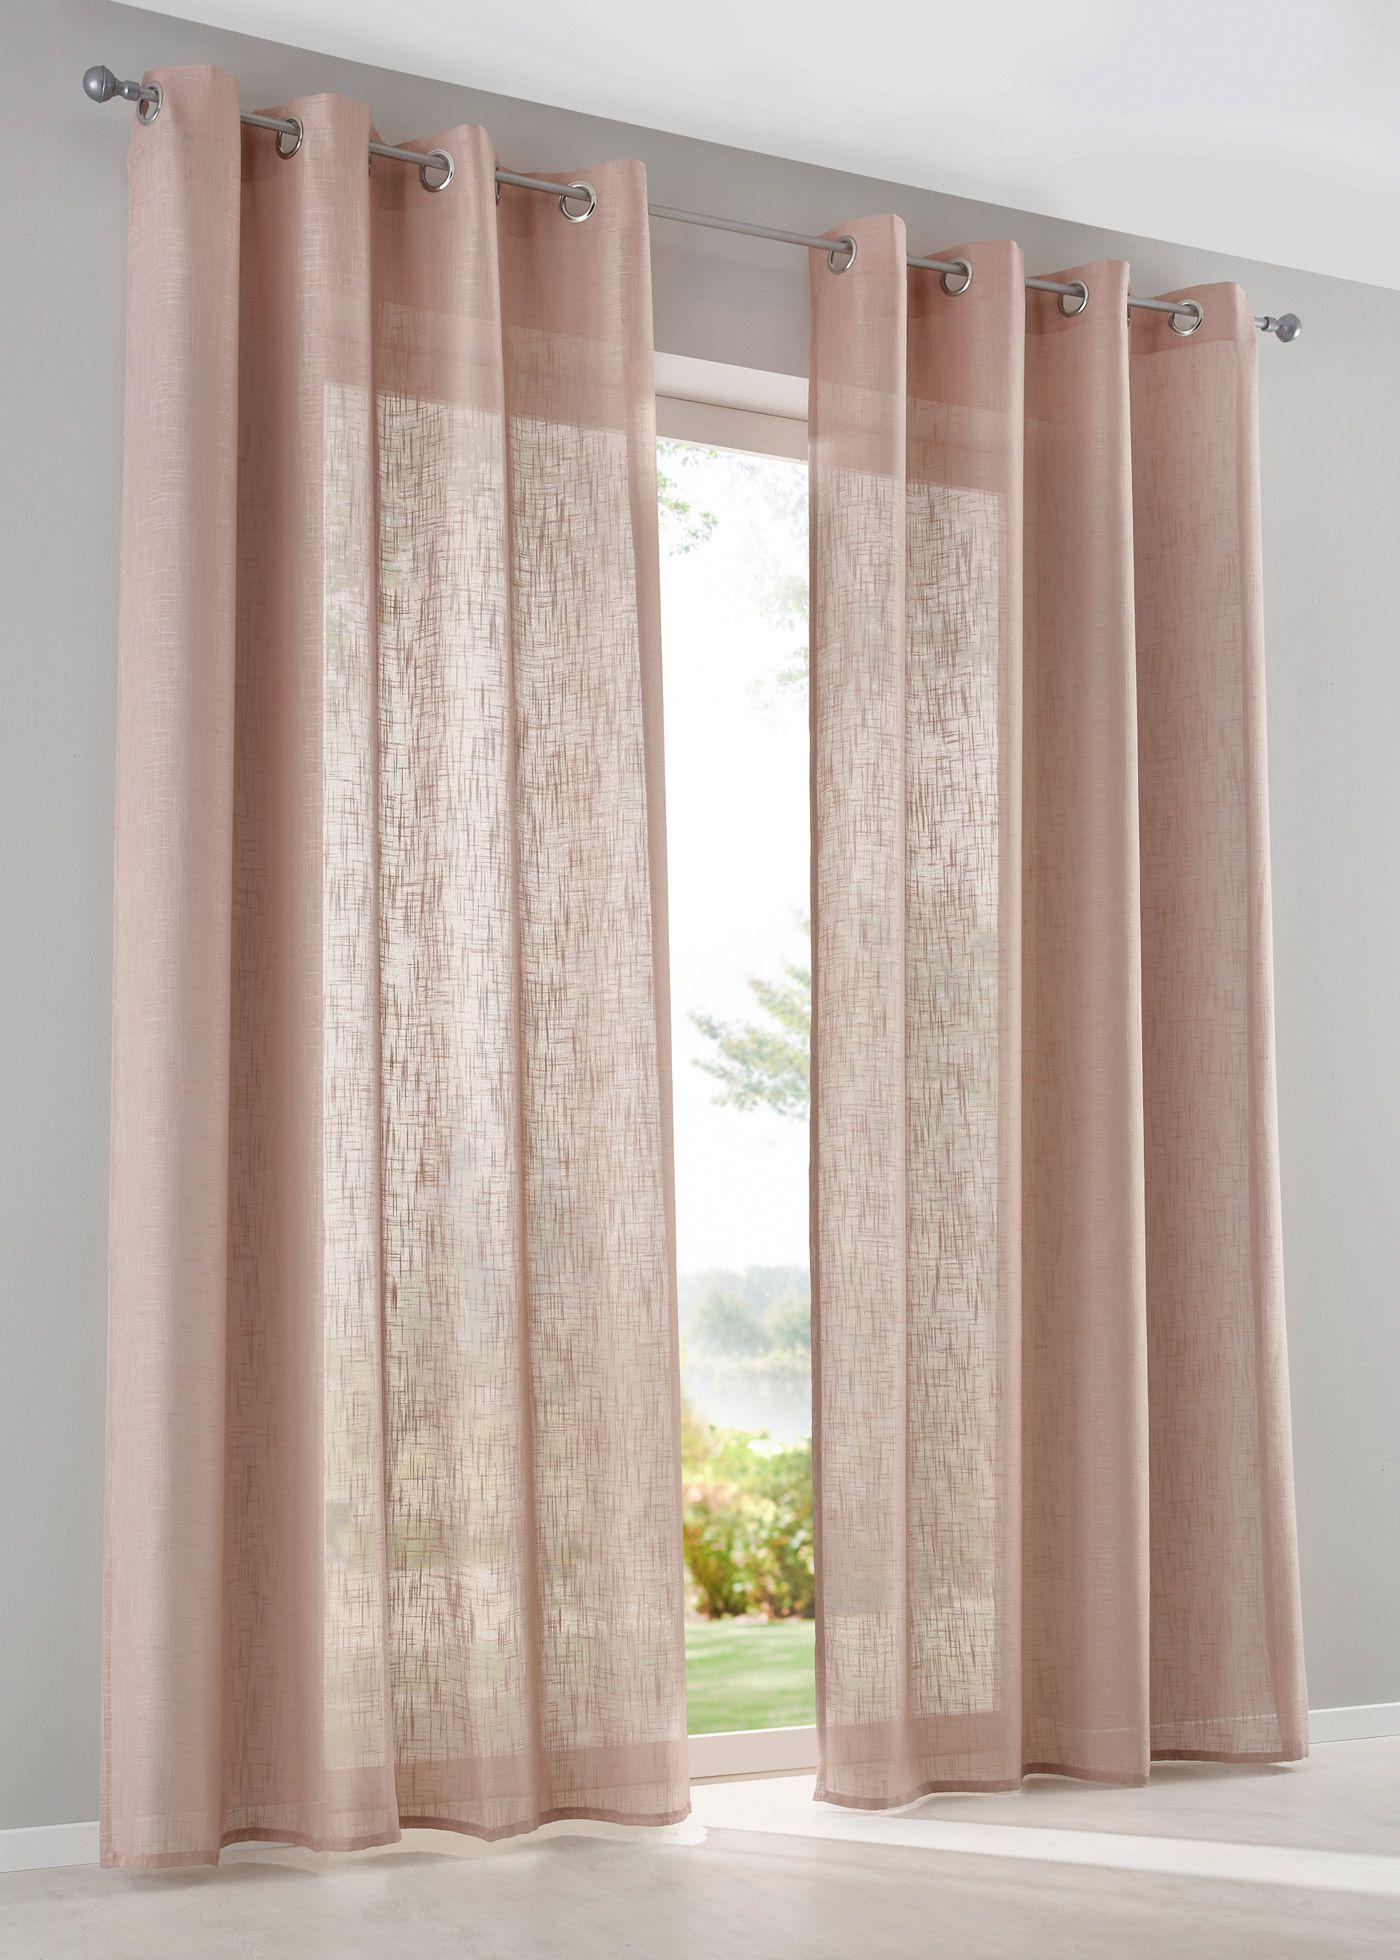 Vorhang In Leinen Optik 1er Pack Osen Rosa Vorhange Vorhange Leinen Leinen Gardinen